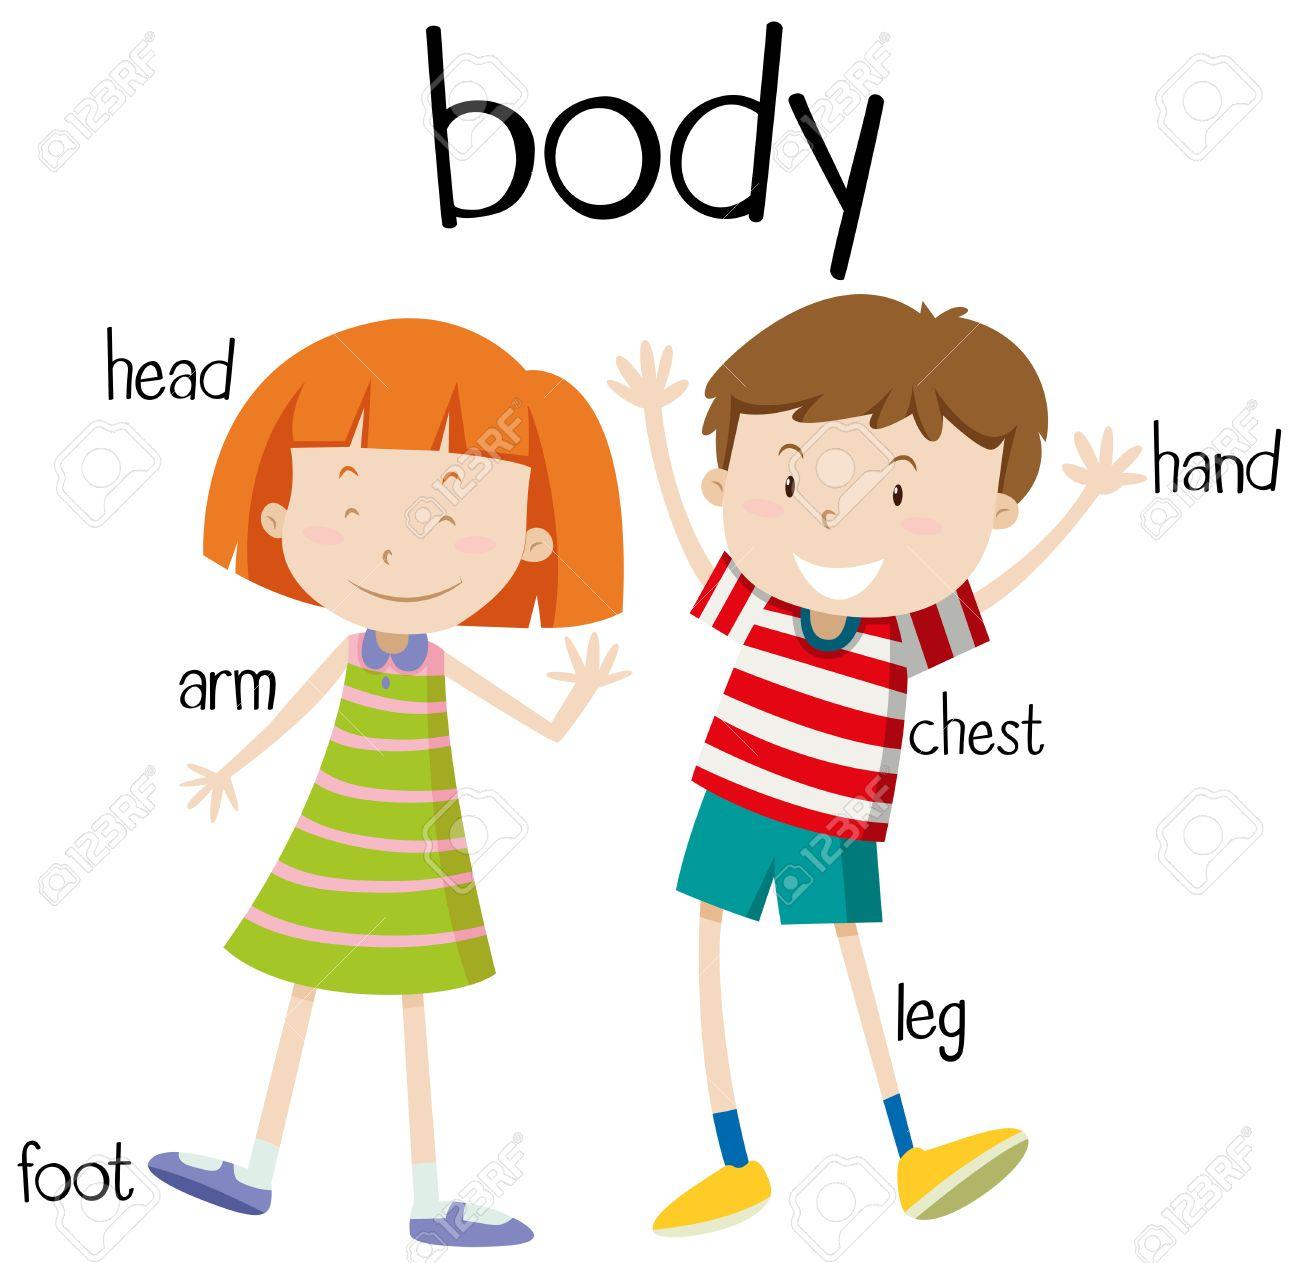 Human body parts diagram illustration.